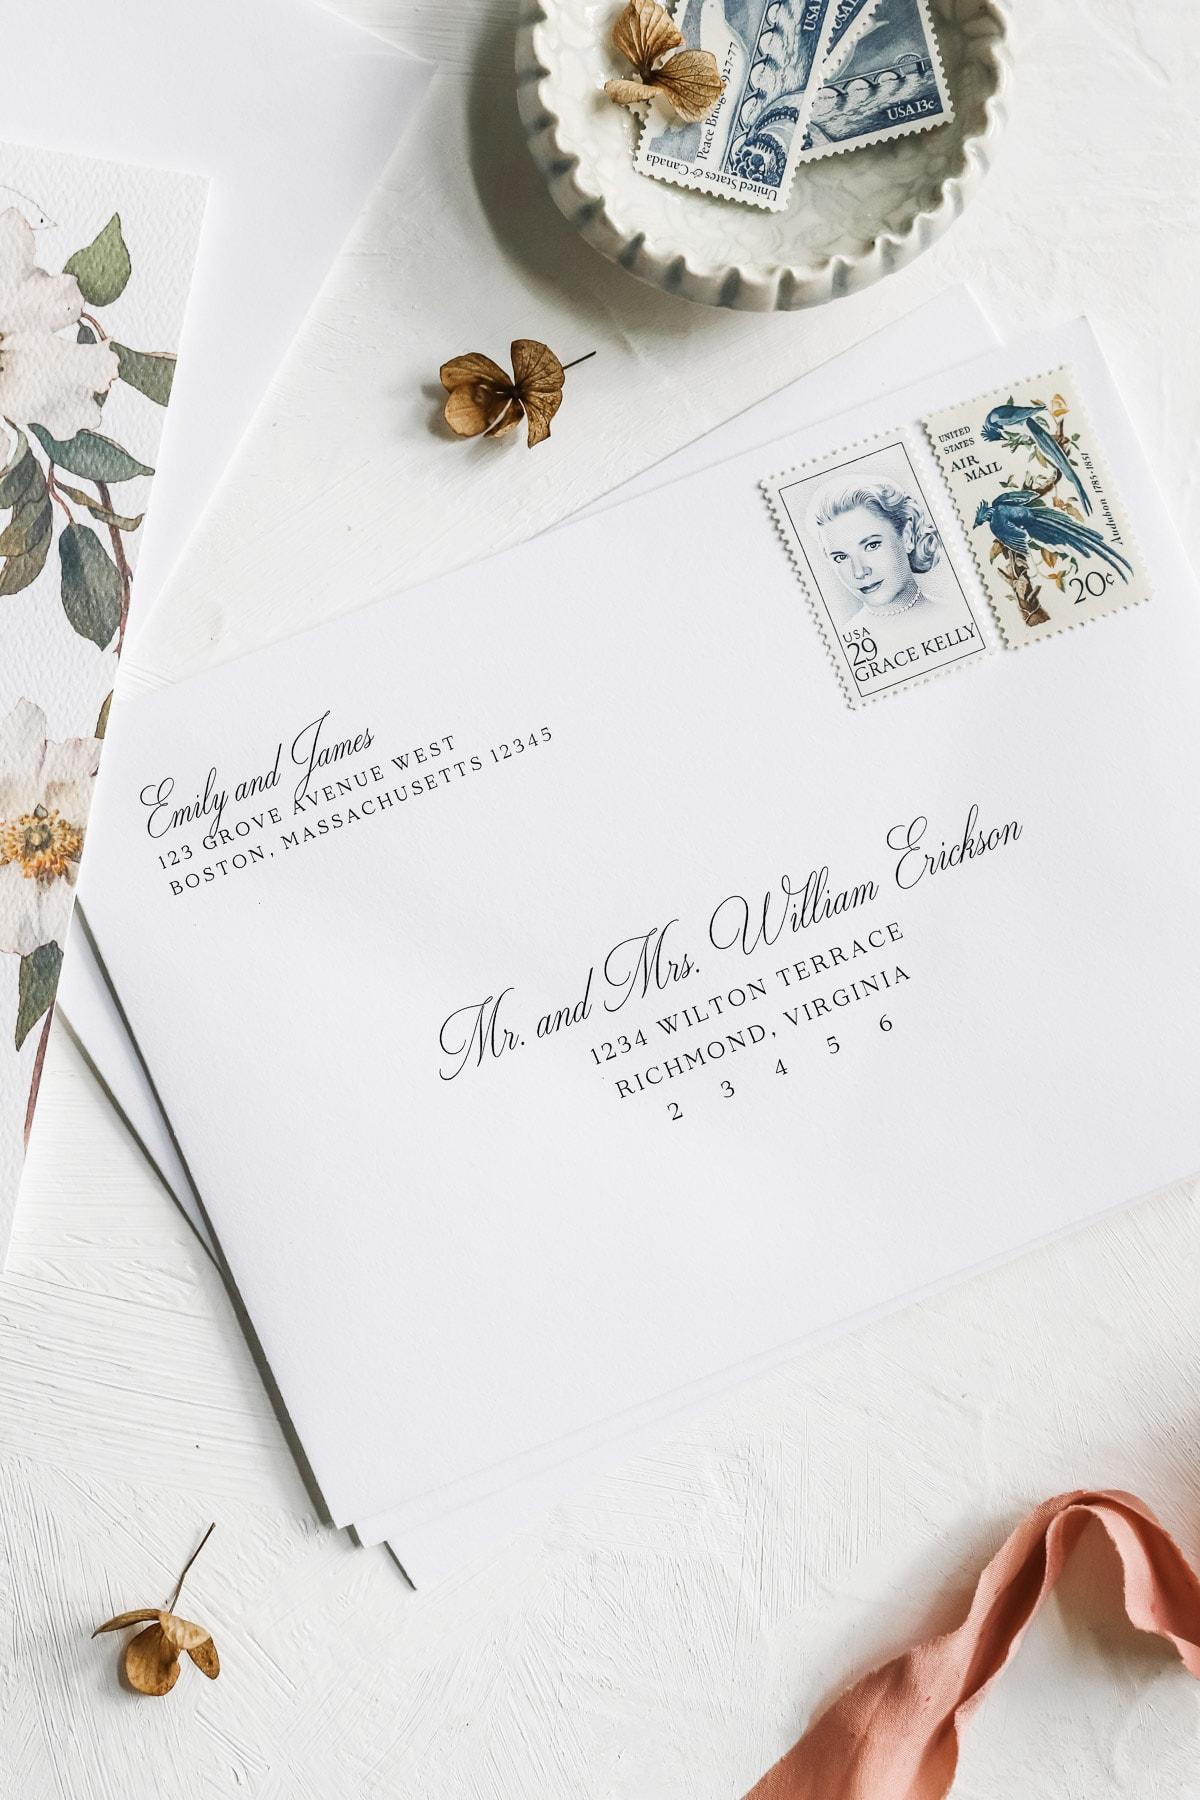 Printable Wedding Envelope Template DIY Wedding Address Envelope Printable Address Envelope Instant Download Printable Envelope